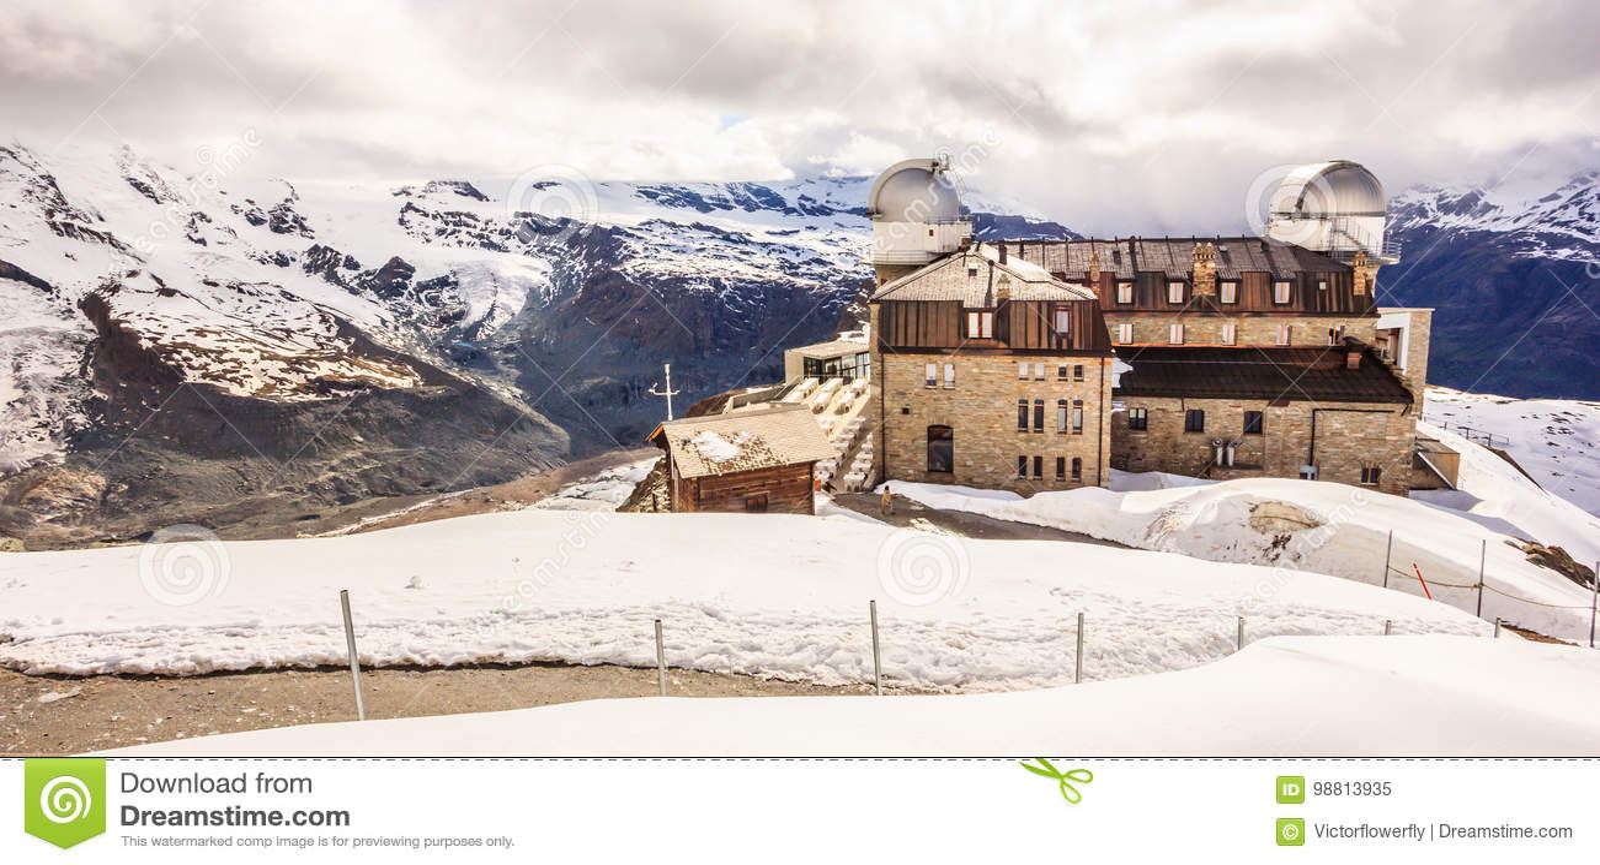 Majestic Dreamy View of snowy Gornergrat station and Matterhorn shrouded with clouds, Zermatt, Switzerland, Europe